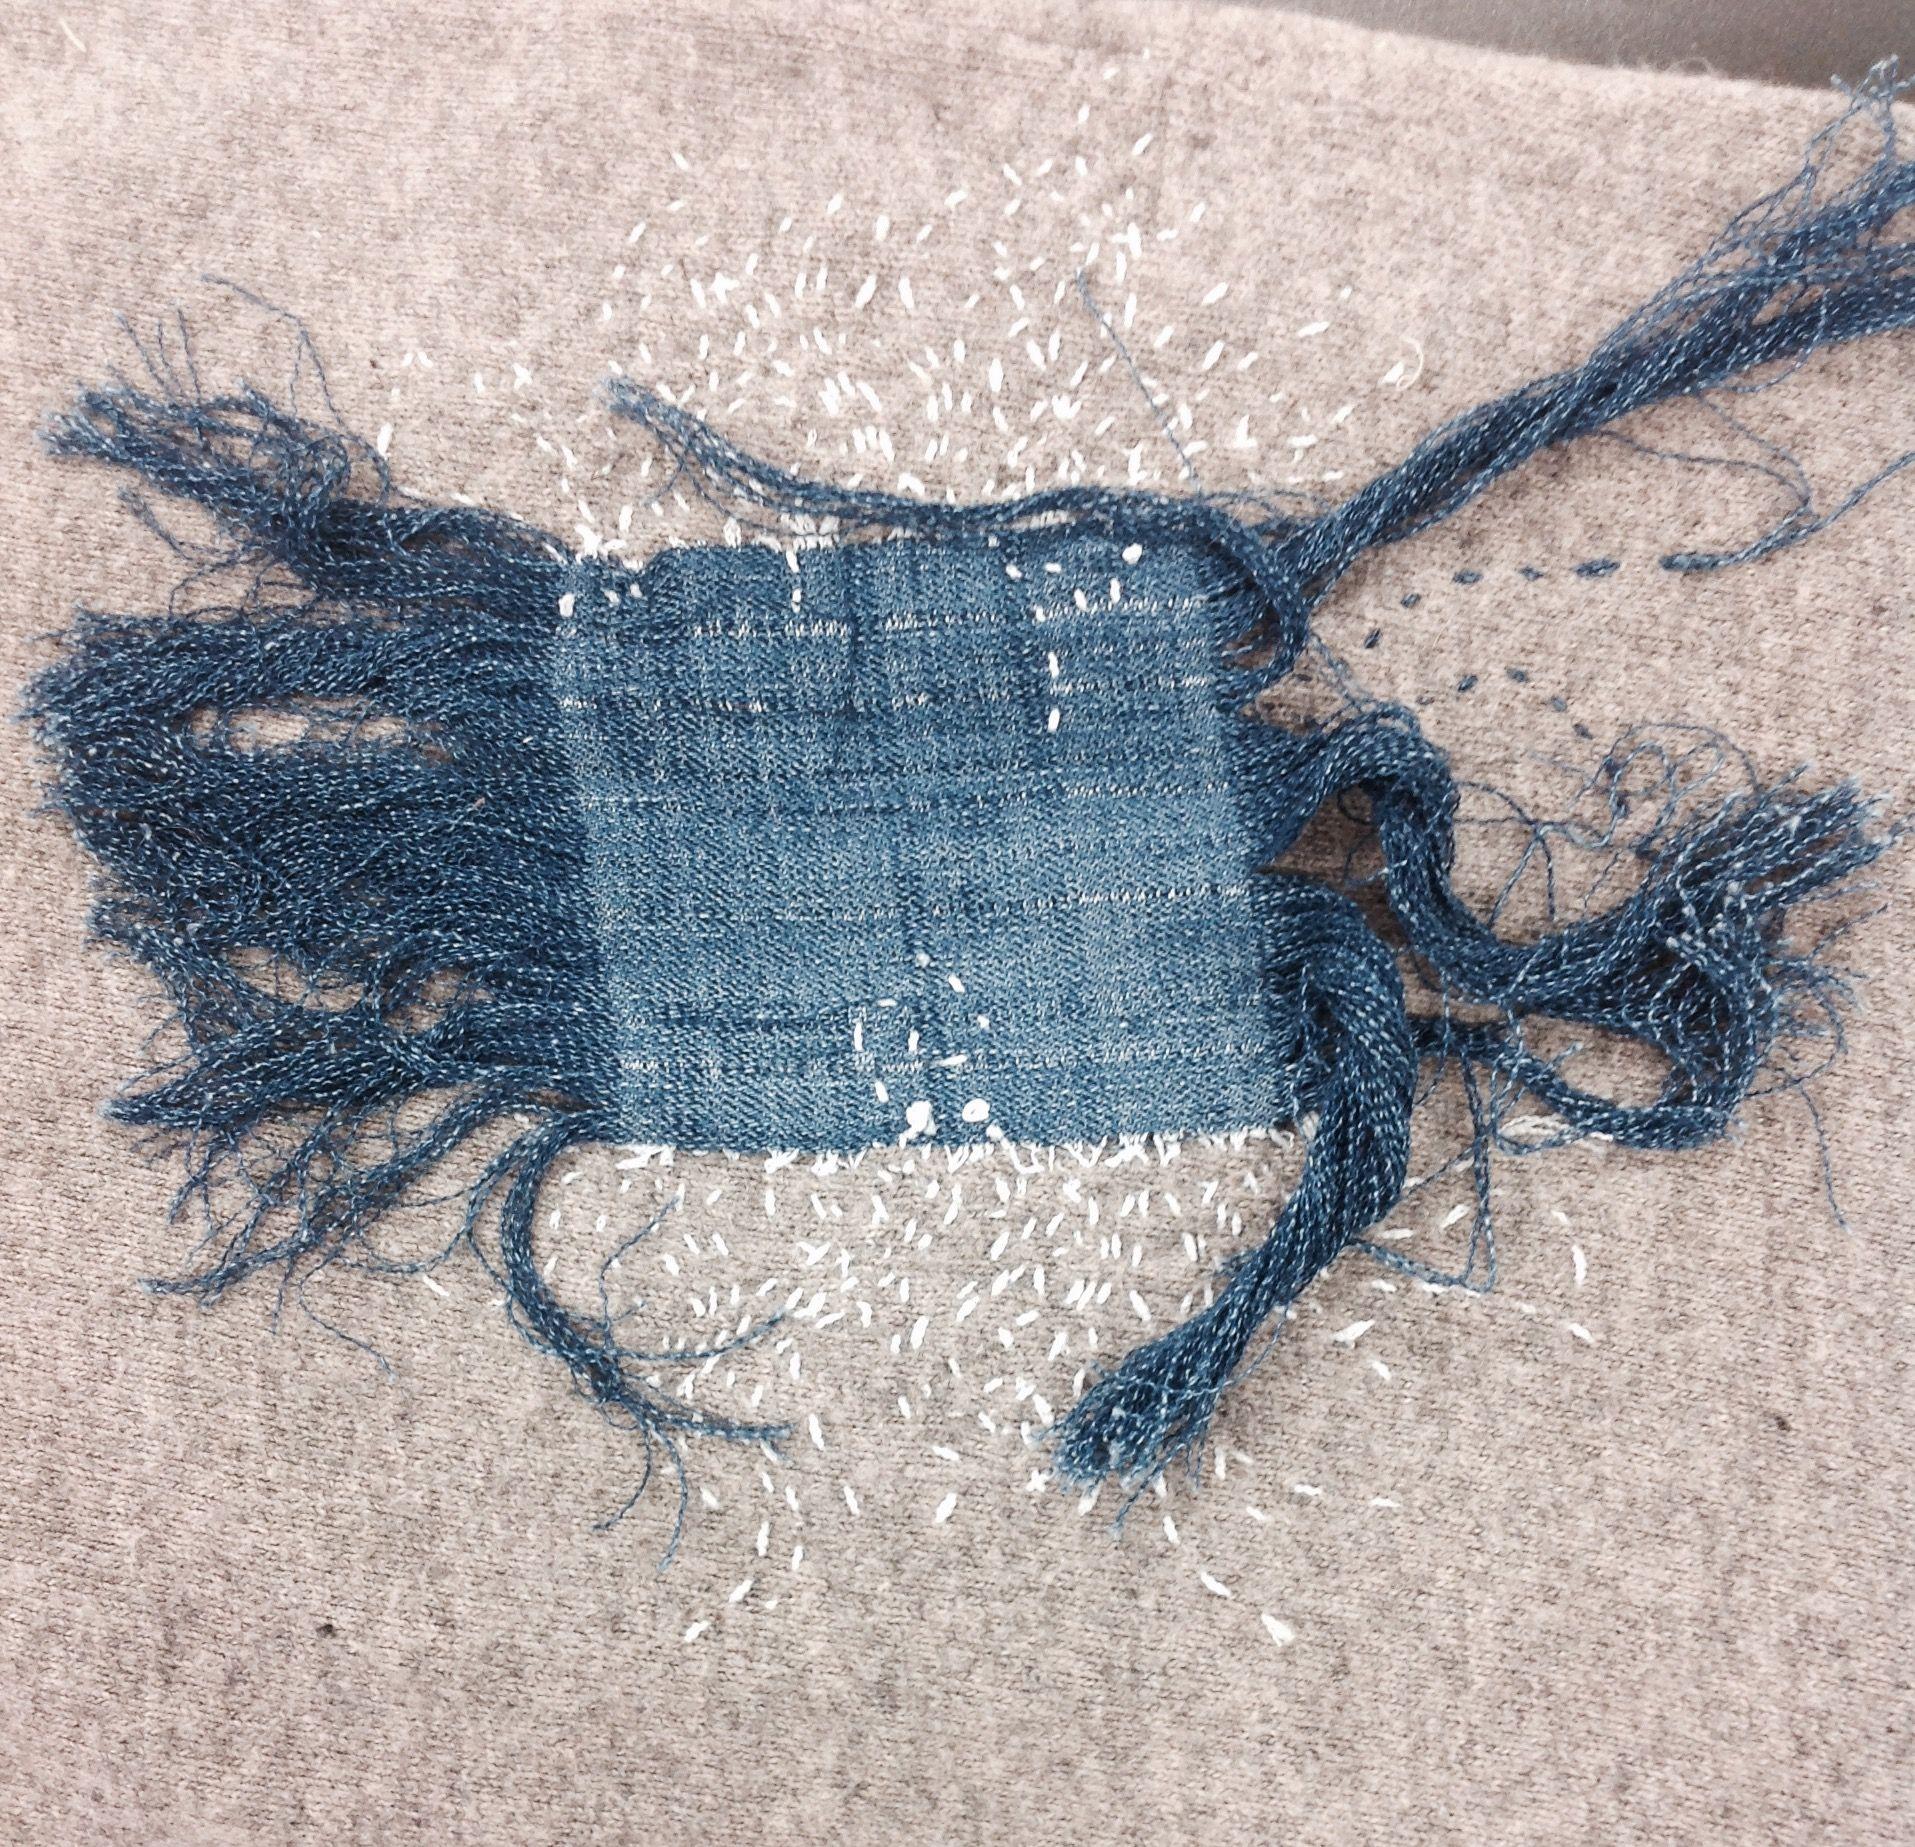 Sally Stewart, 2016, Textile Practice, University of Huddersfield